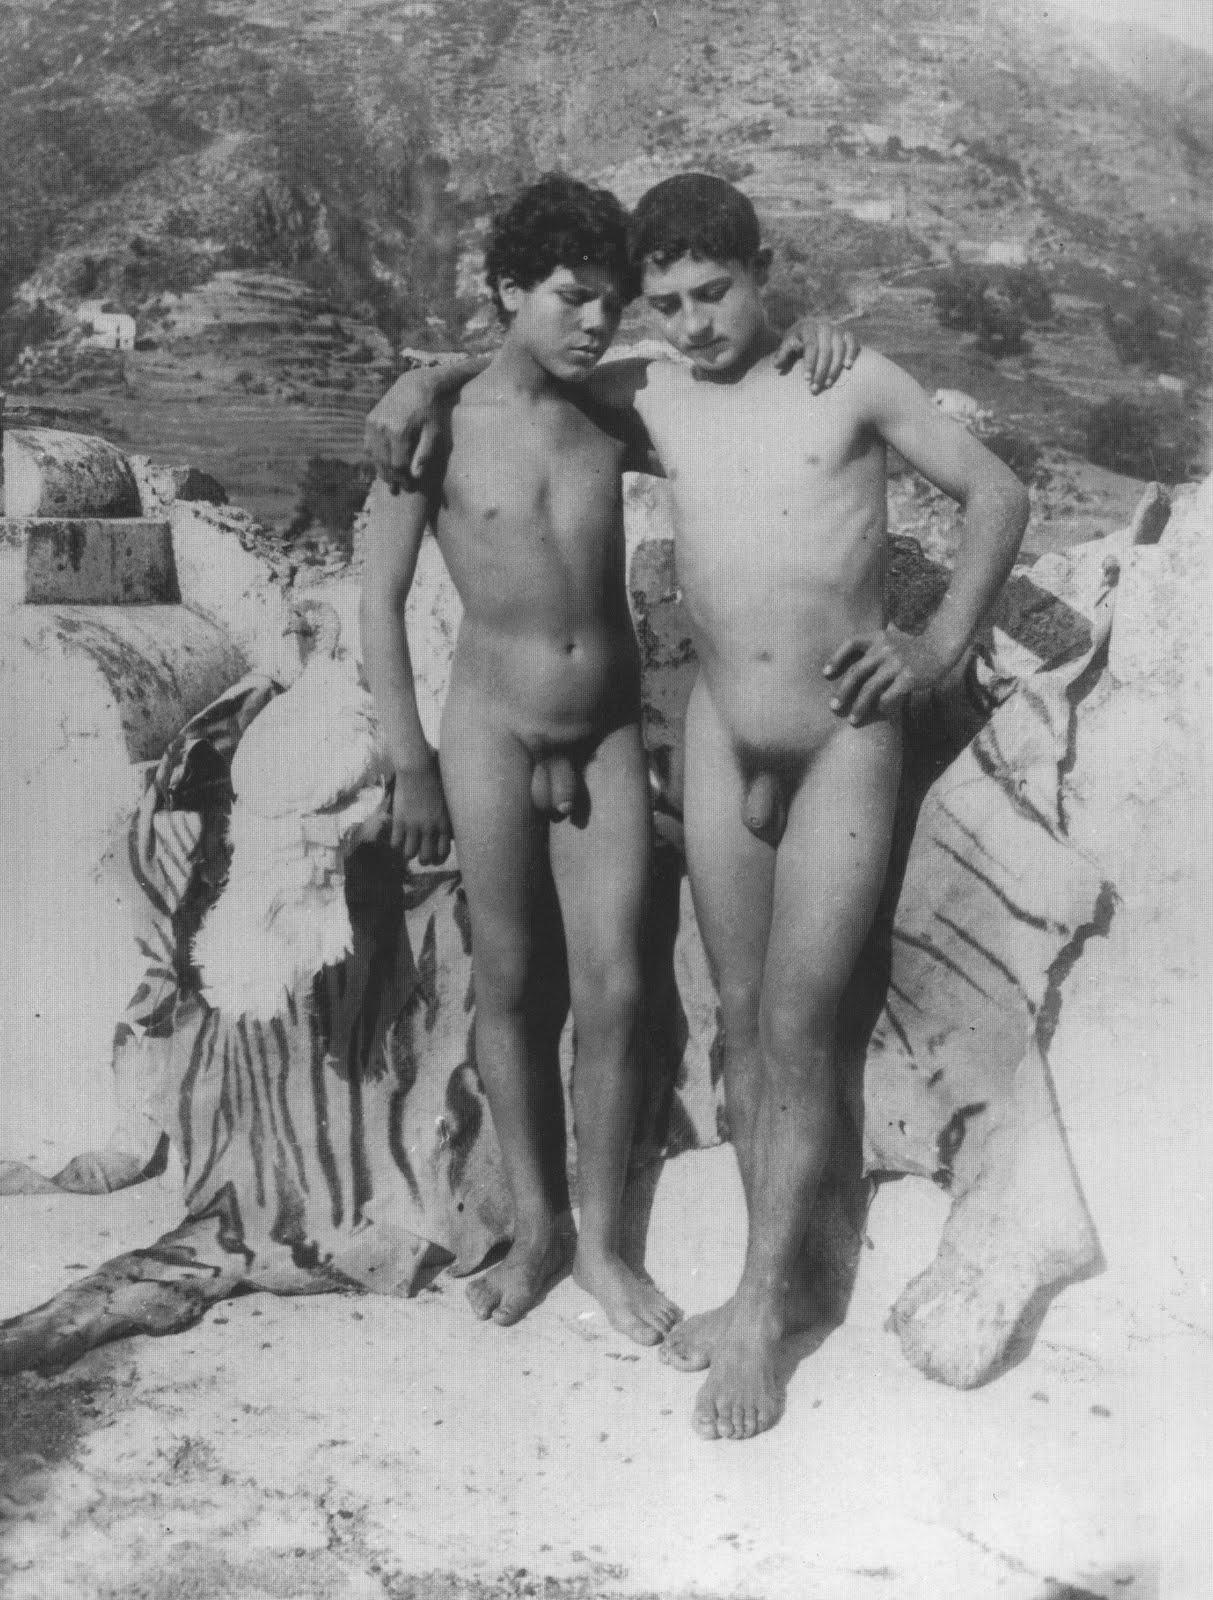 escort bois maschi nudi gay